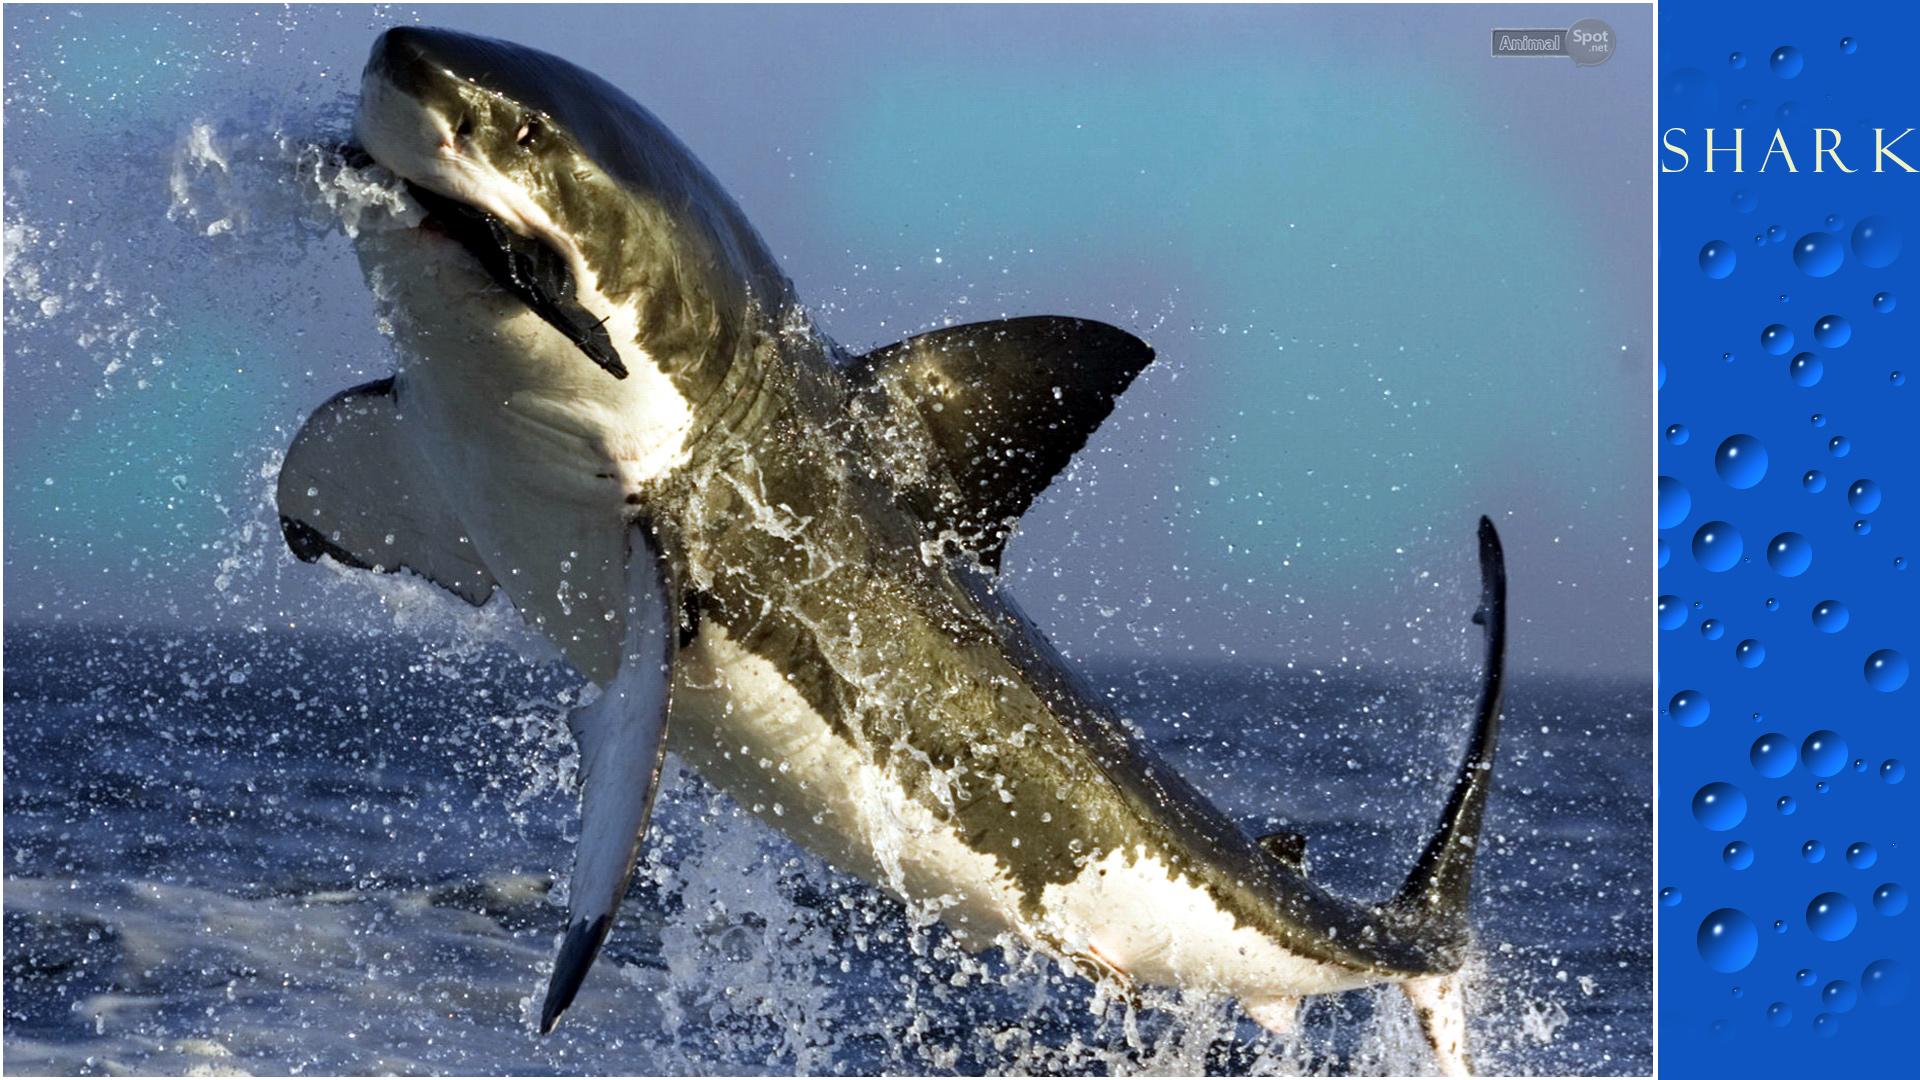 Live Shark Wallpaper for PC - WallpaperSafari